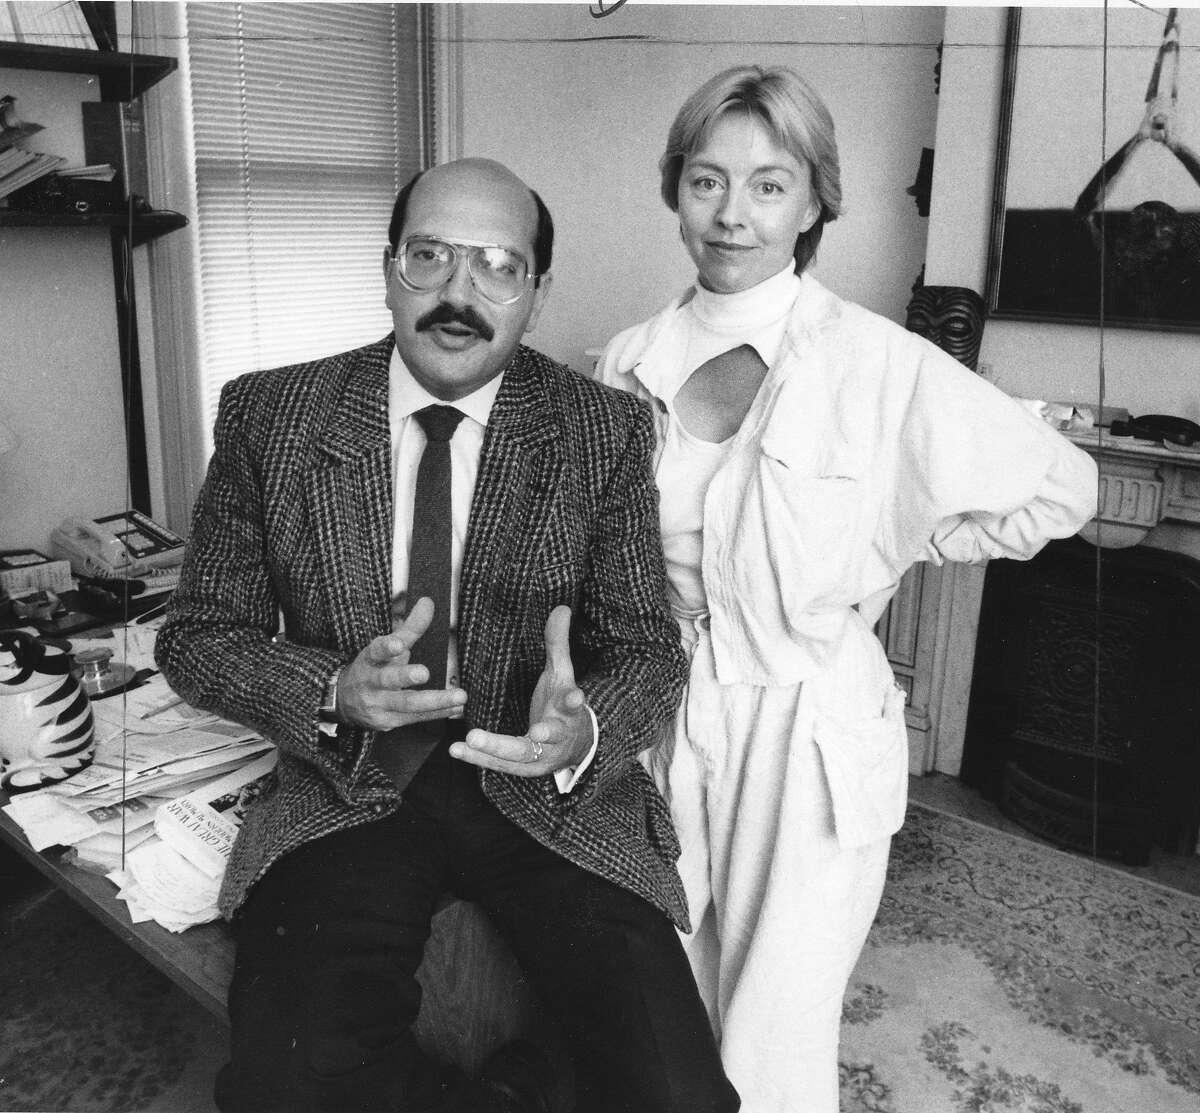 Private Investigators Jack Palladino and Sandra Sutherland, August 21, 1984